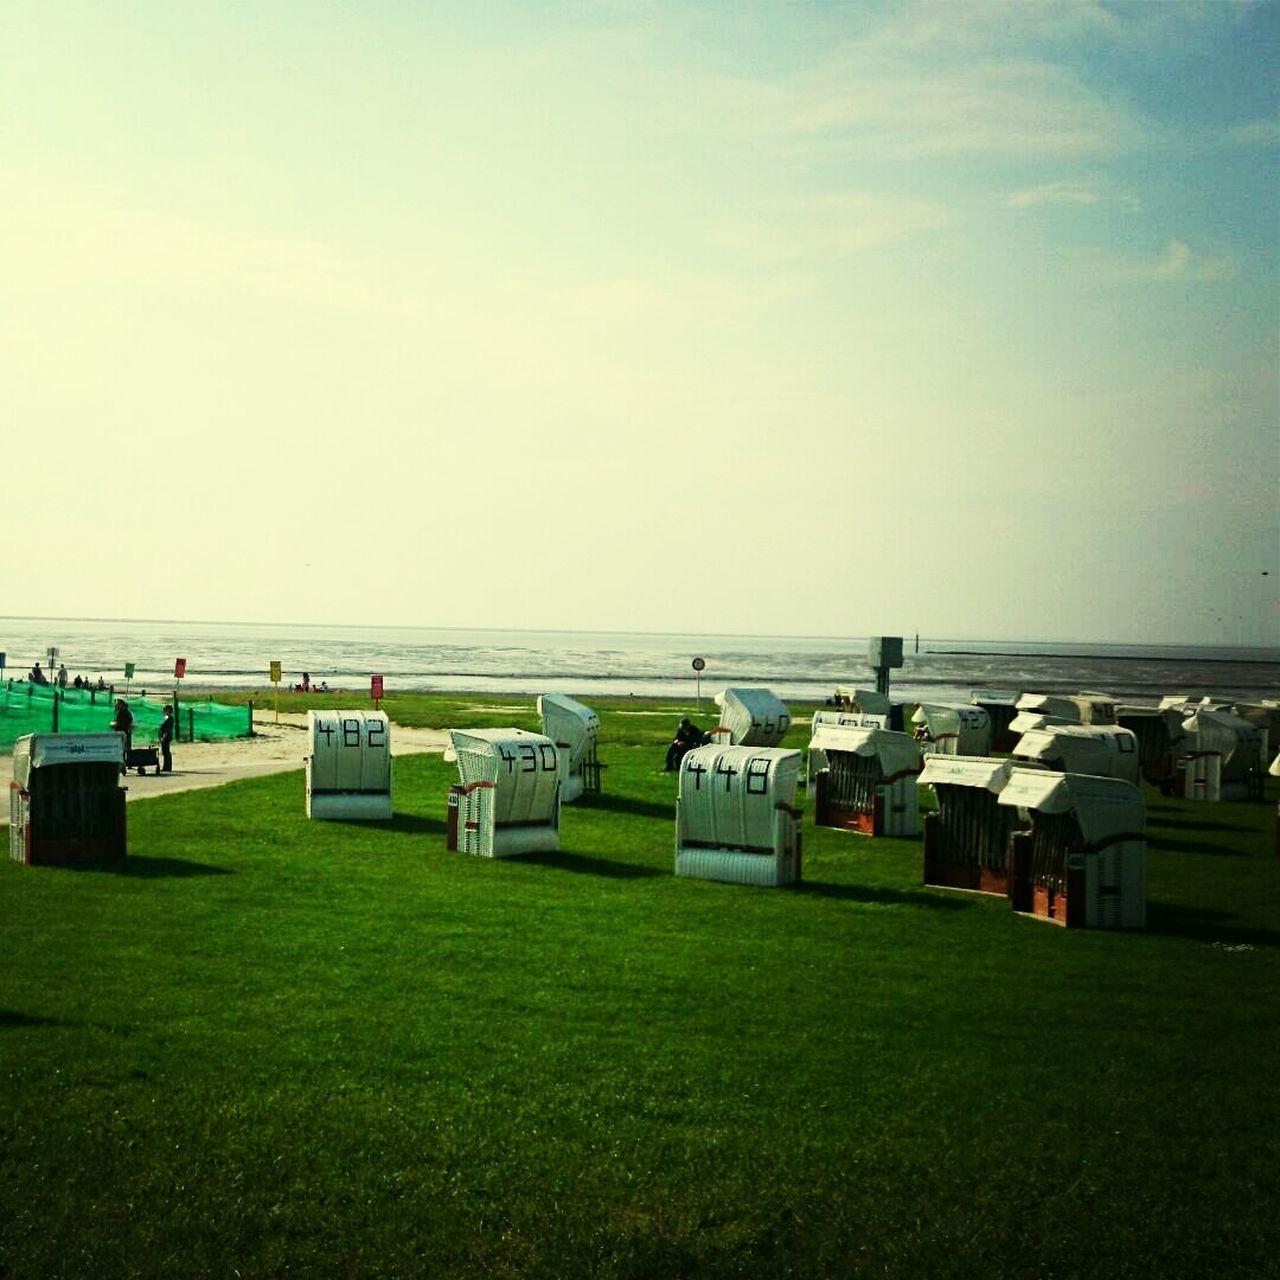 Cabins on the seashore